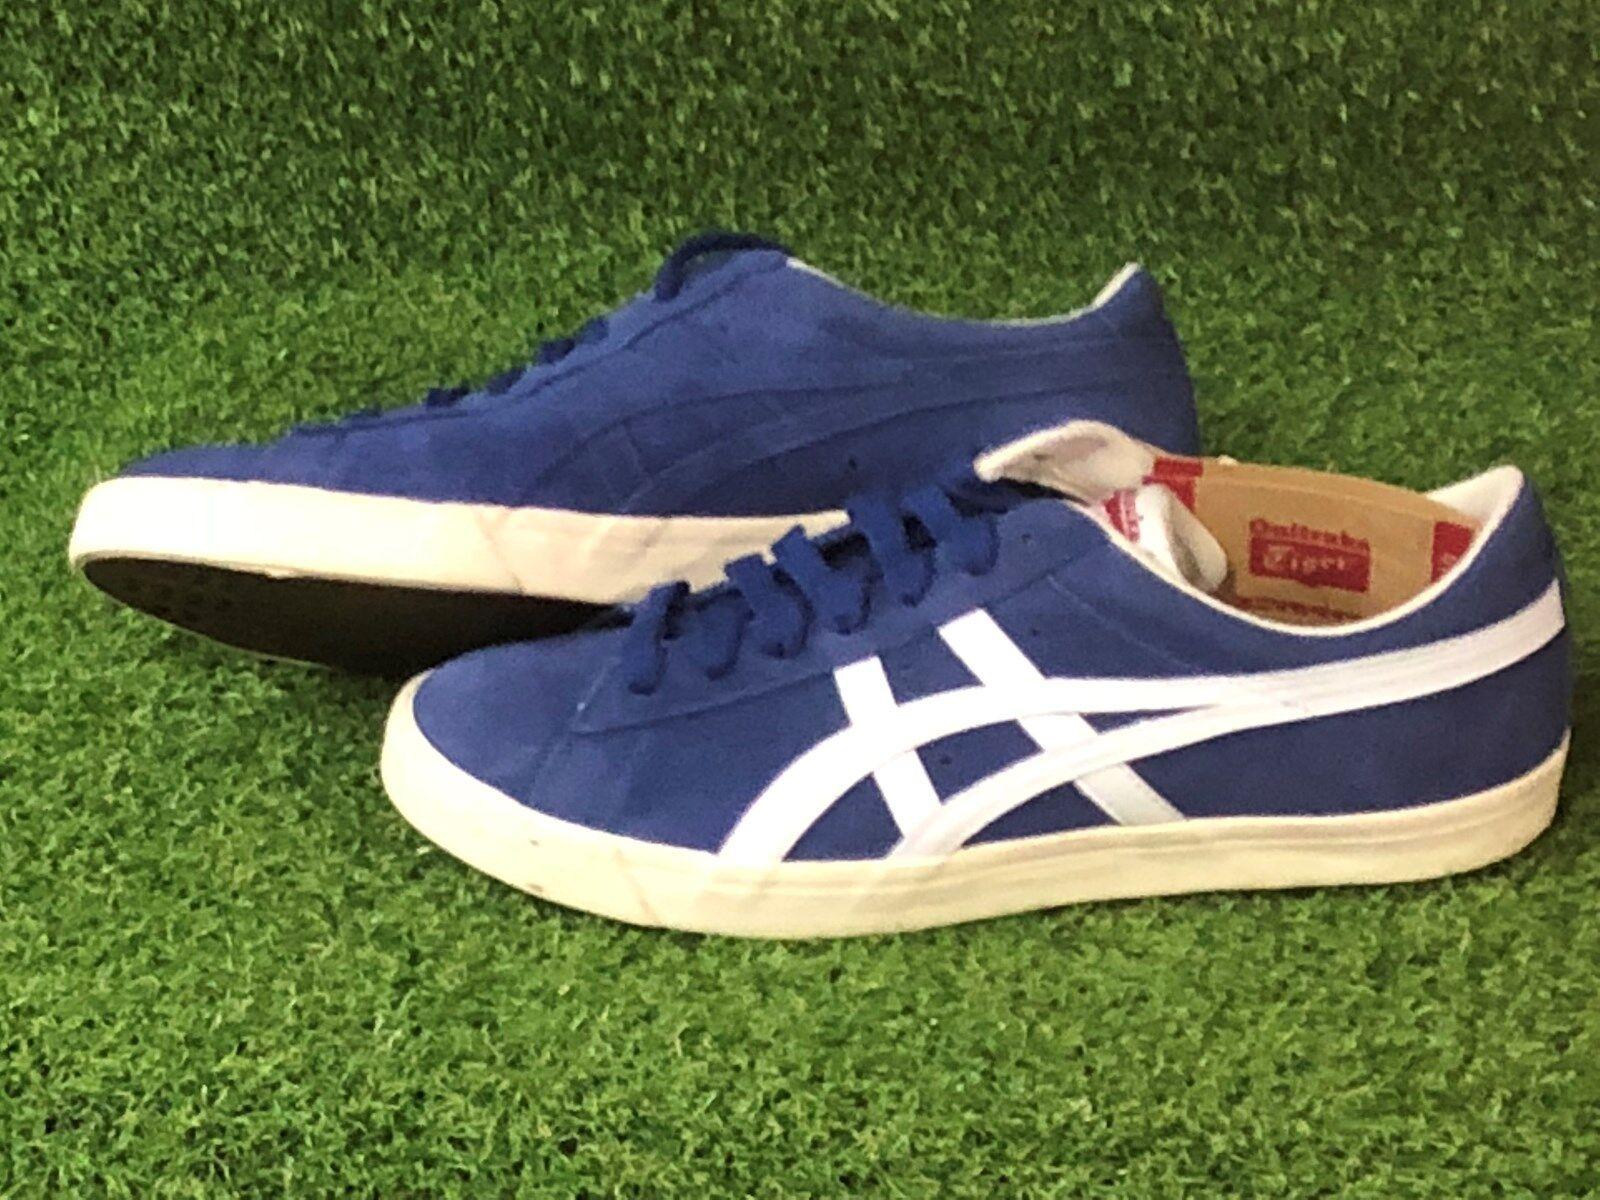 Asics Fabre BL S OG VIN [ Tiger Sneaker Zapatos  [ VIN D221L 5001 ] Gr. 44,5 Neu OVP 342e7d